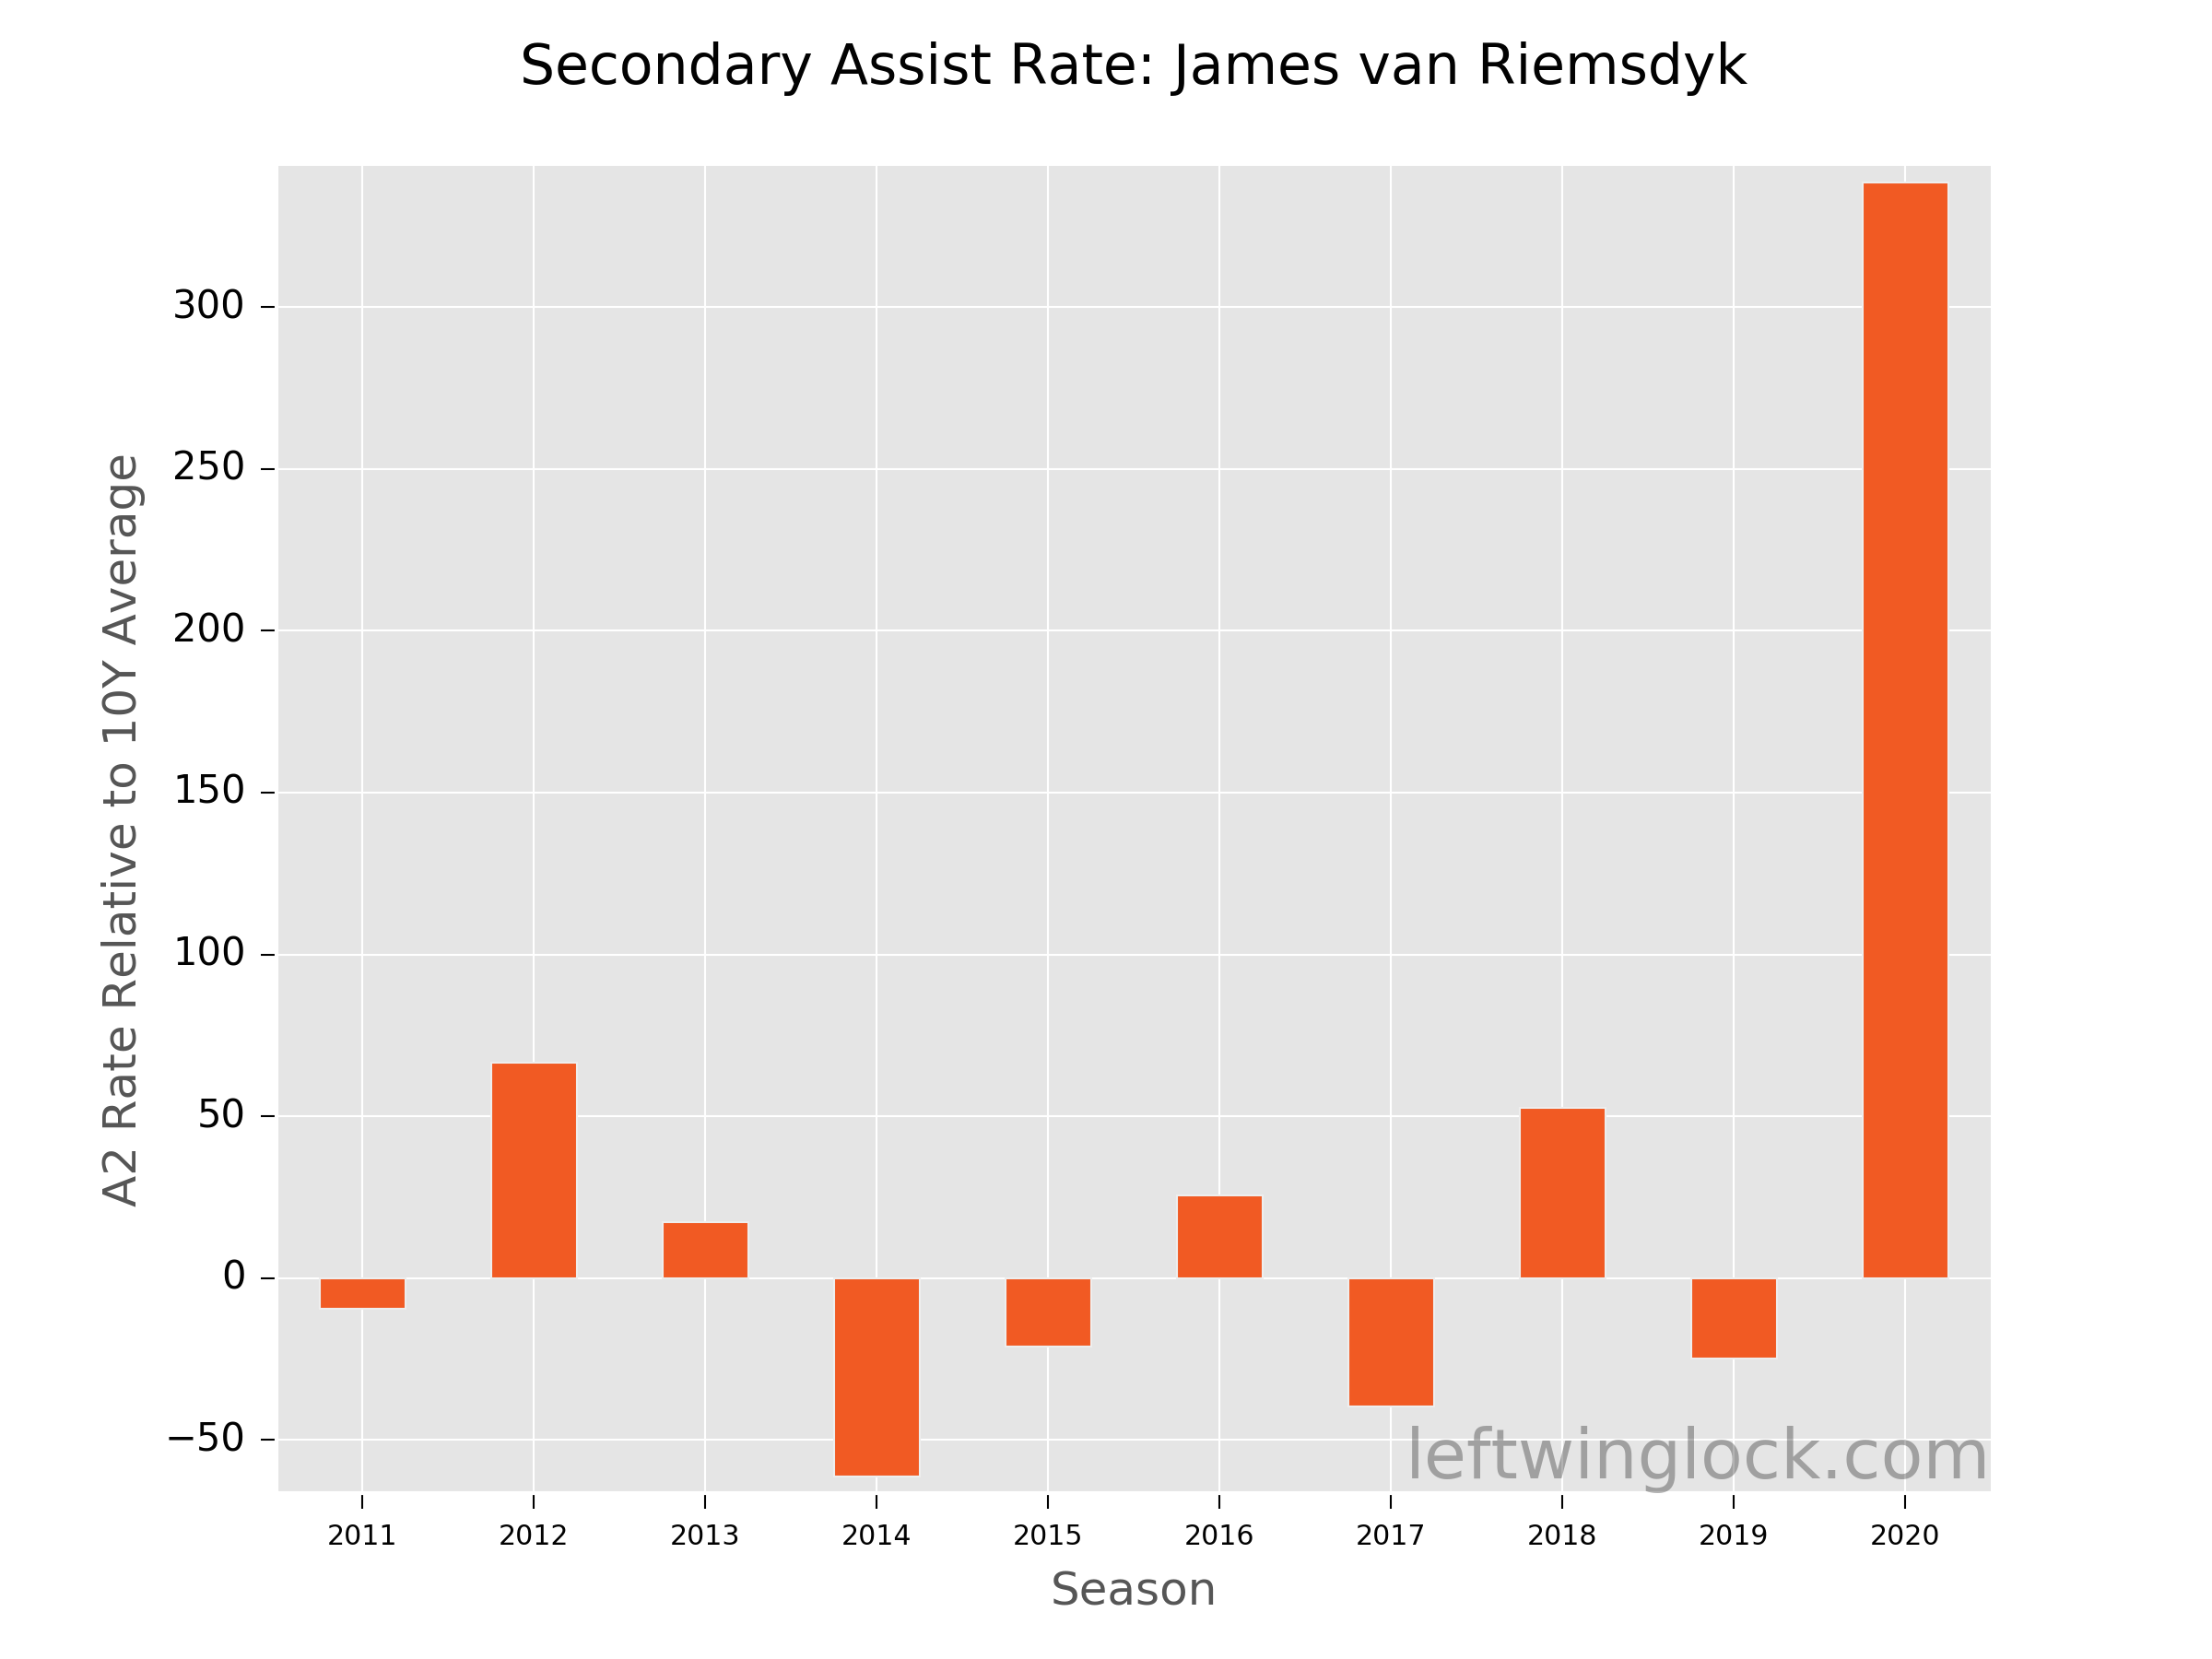 James van Riemsdyk Secondary Assist Rate